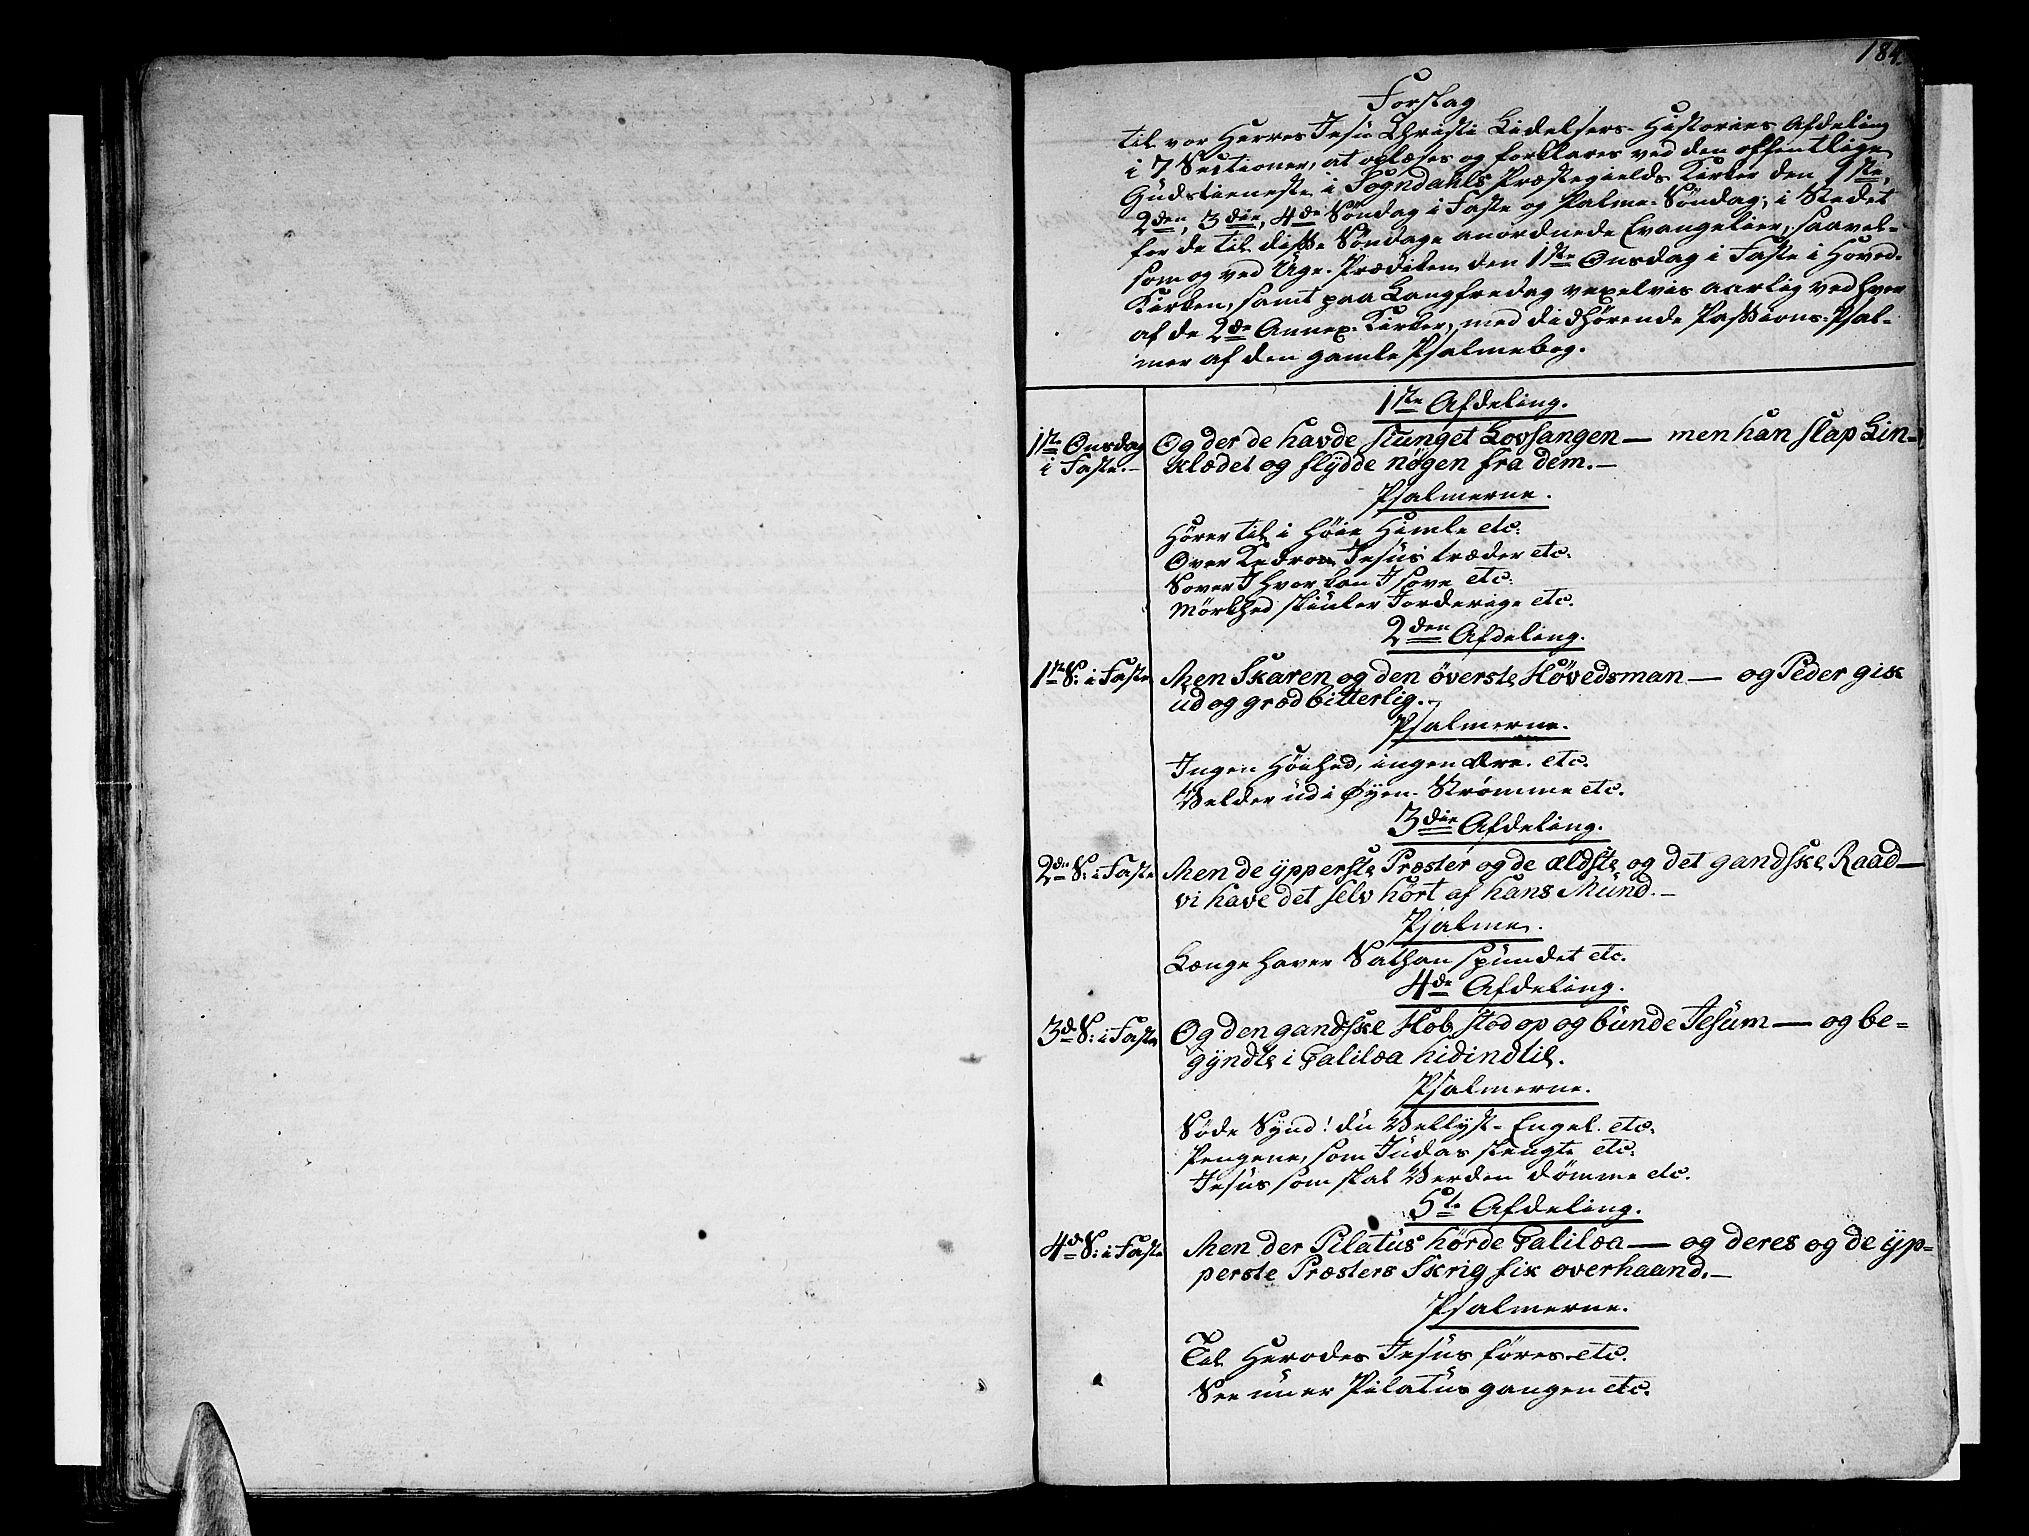 SAB, Sogndal sokneprestembete, H/Haa/Haaa/L0009: Ministerialbok nr. A 9, 1809-1821, s. 184